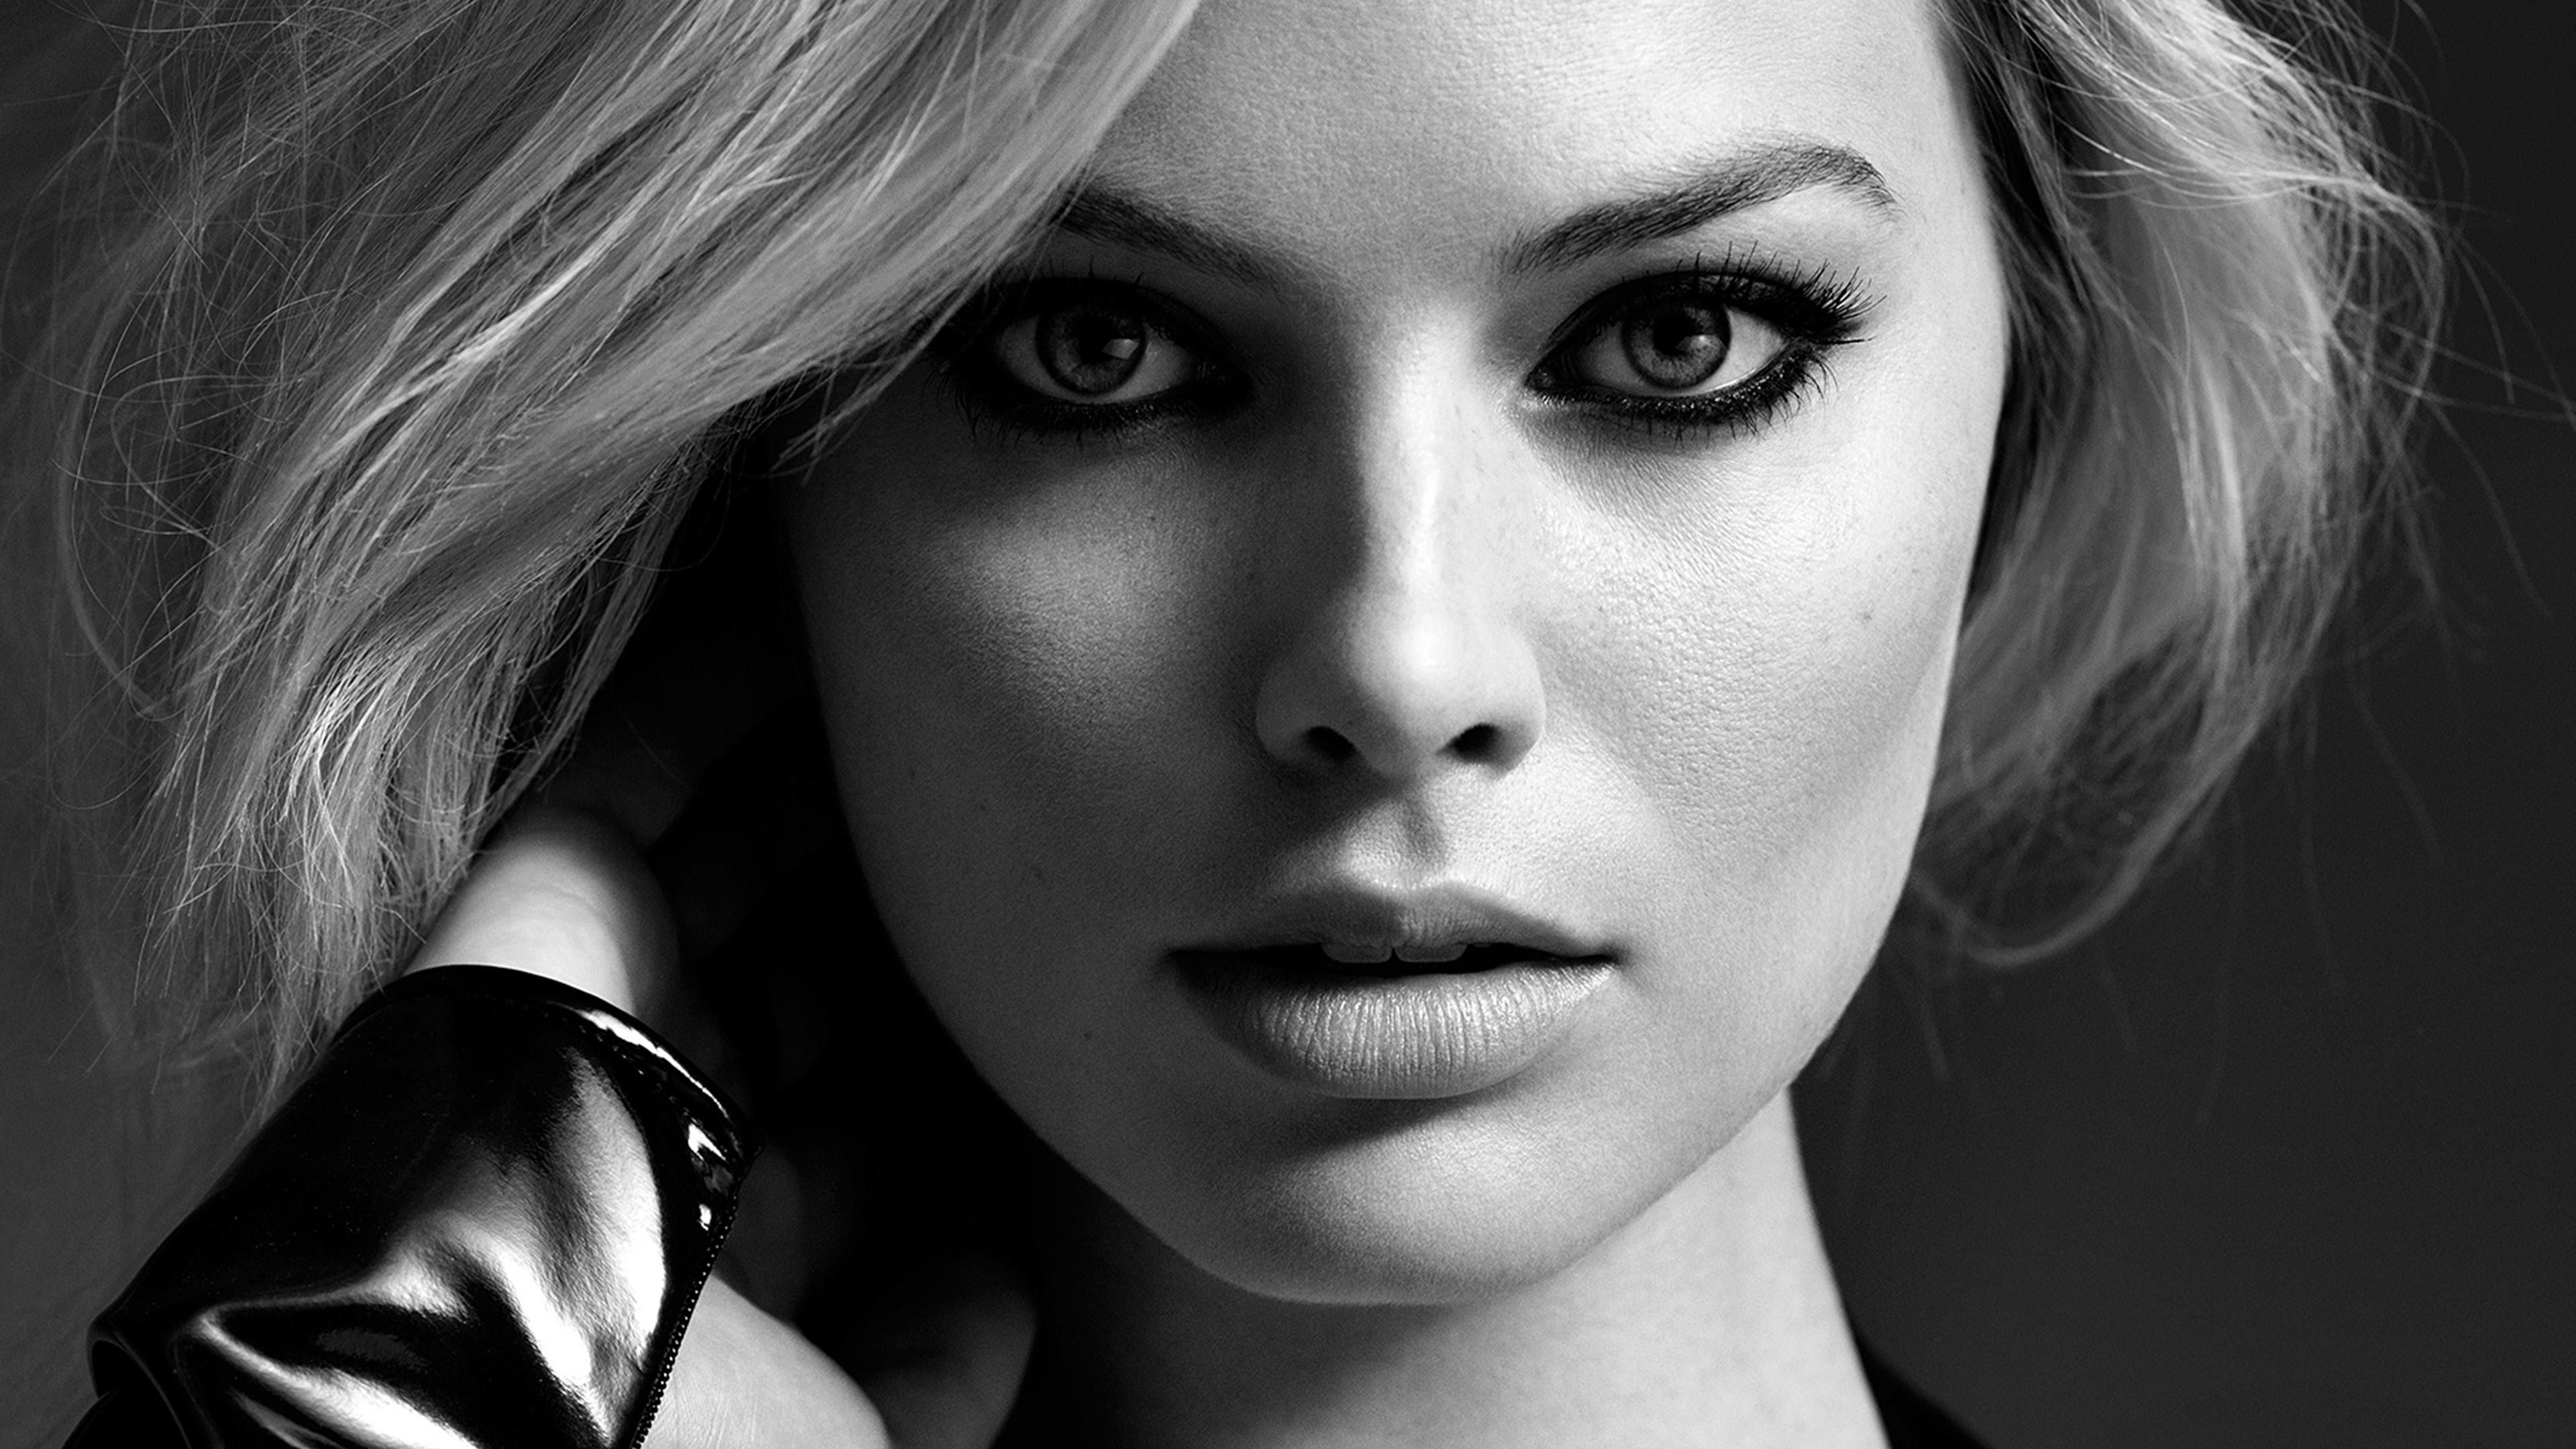 Hr76 Girl Face Margot Robbie Face Bw Dark Wallpaper